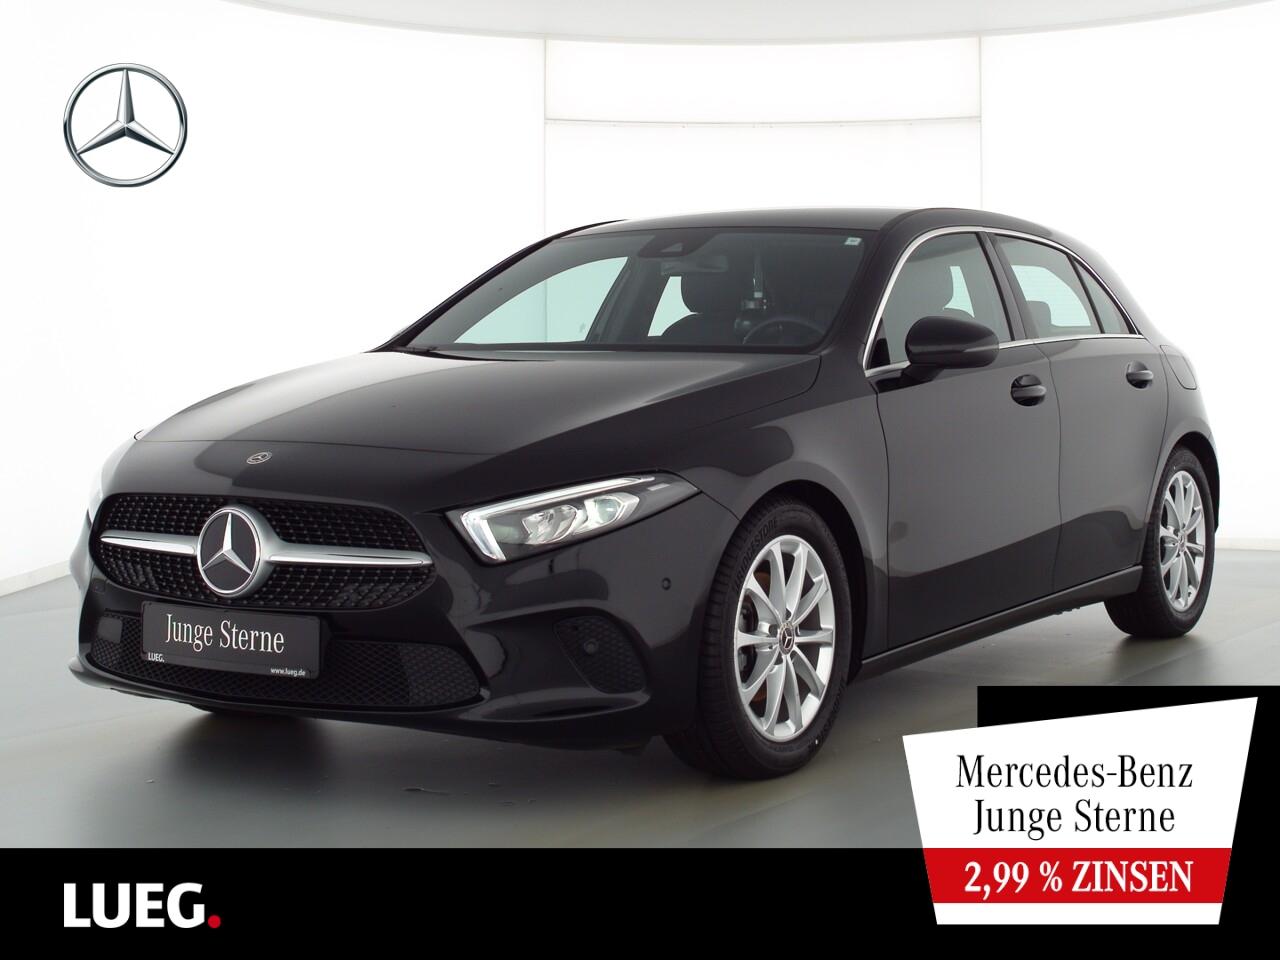 Mercedes-Benz A 180 d Progressive+MBUX+NavPr+LED-HP+ParkAssist, Jahr 2020, Diesel